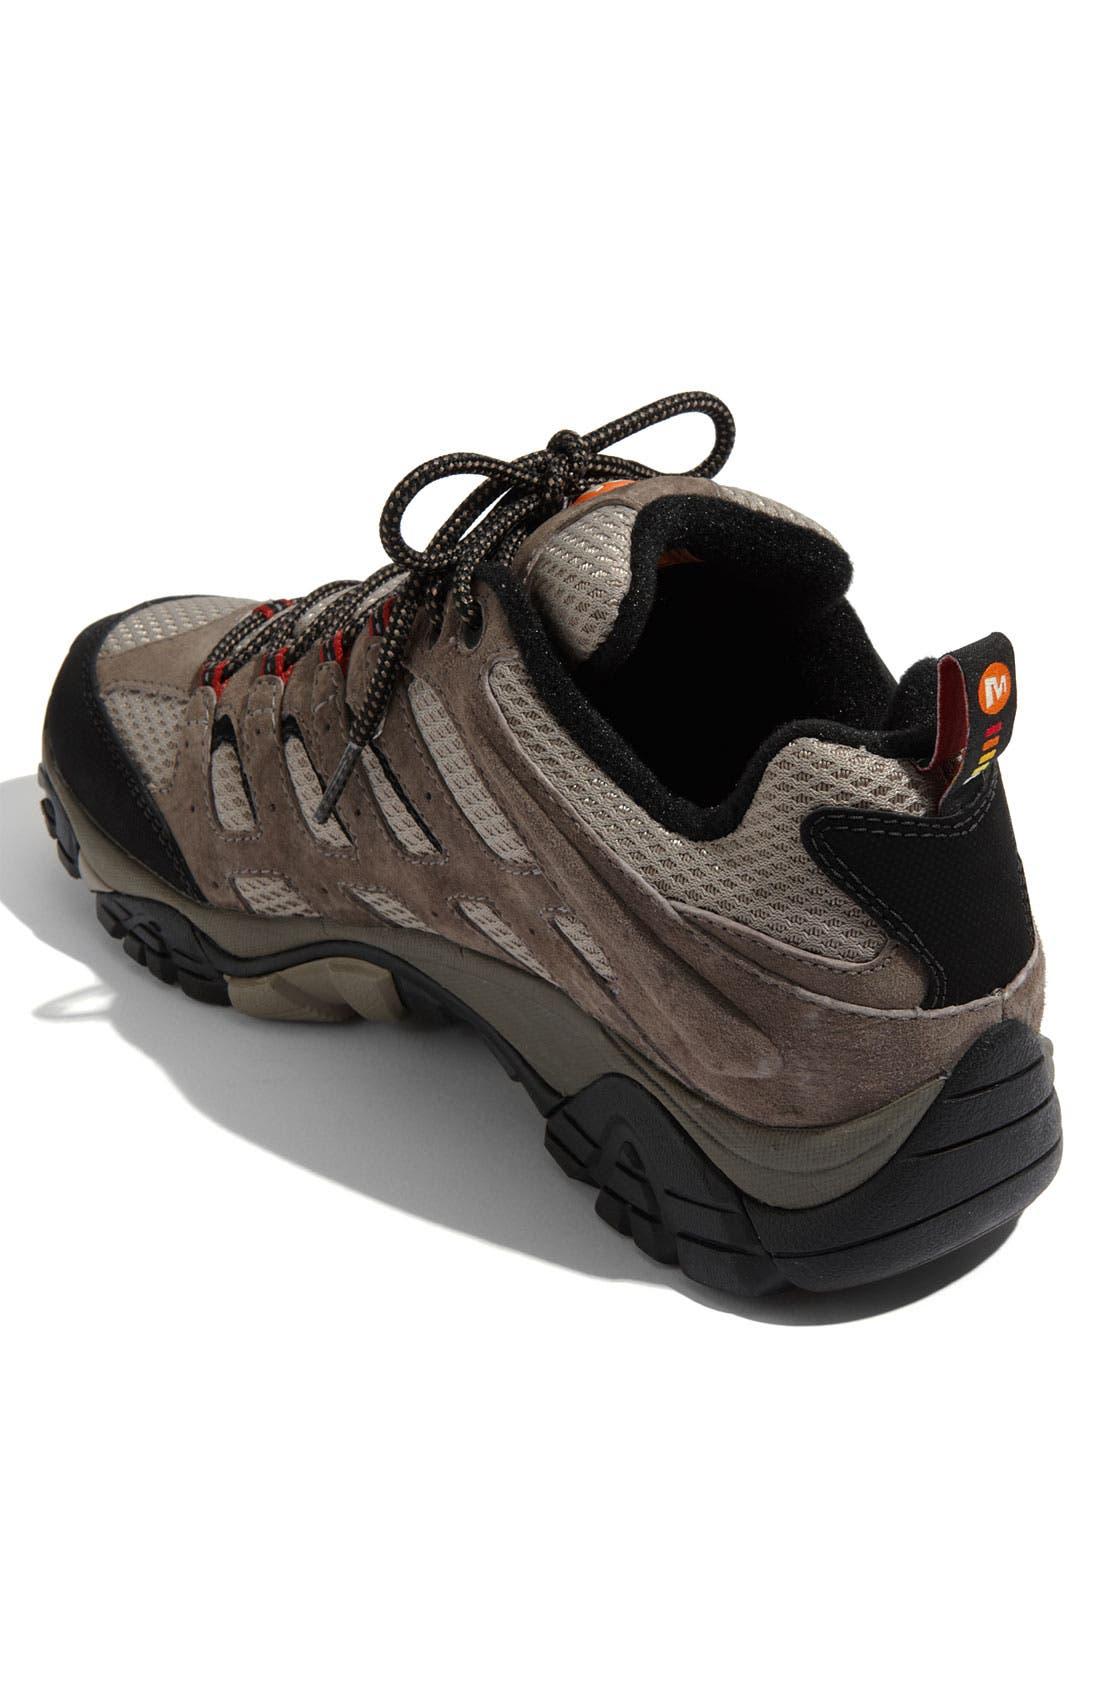 Alternate Image 2  - Merrell 'Moab' Waterproof Hiking Shoe (Men)